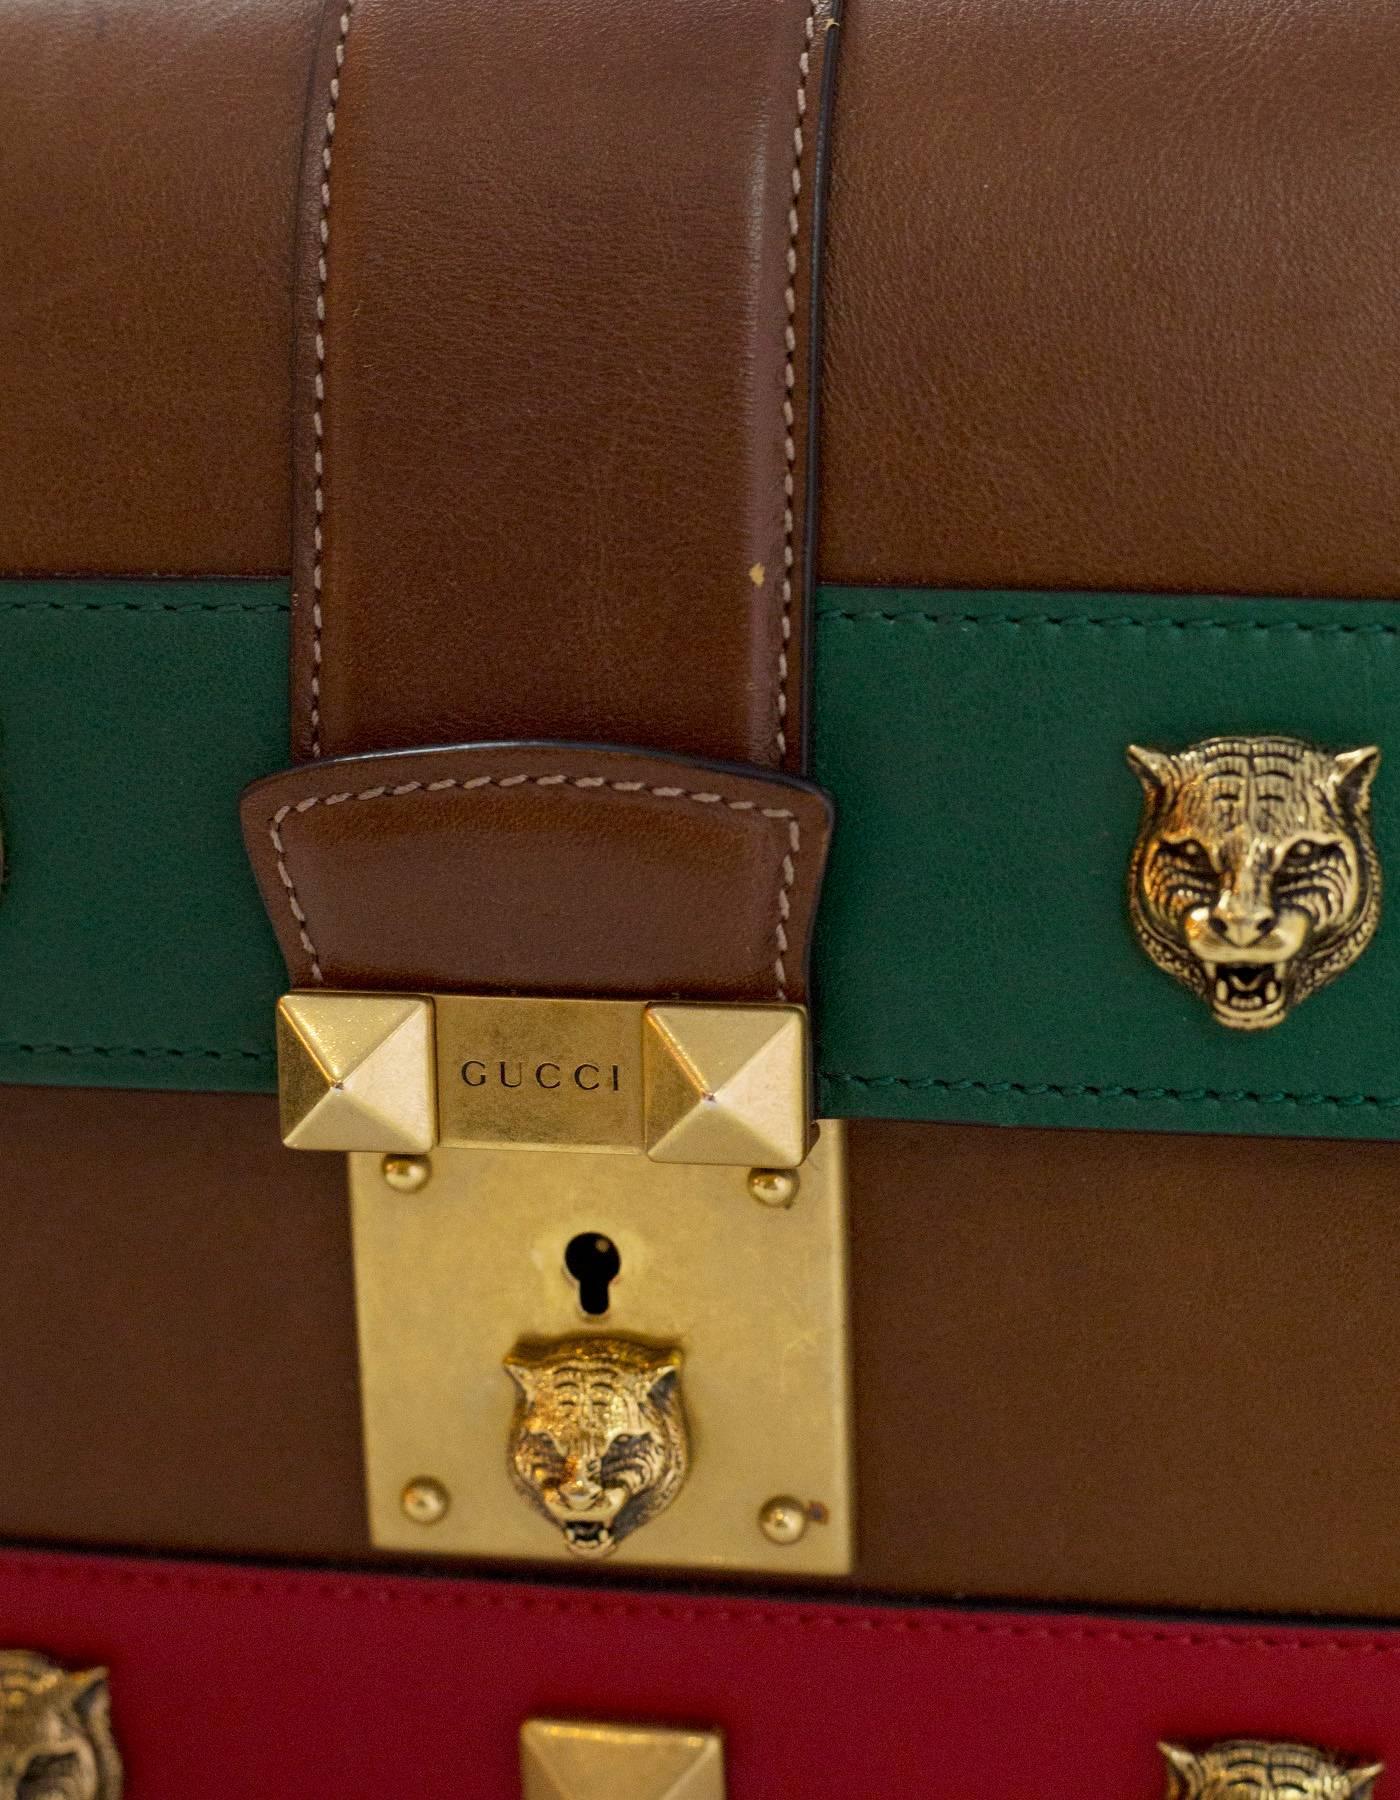 Gucci Brown Red Green Feline Studded Lock Top Handle Bag JRfDLGlXKg